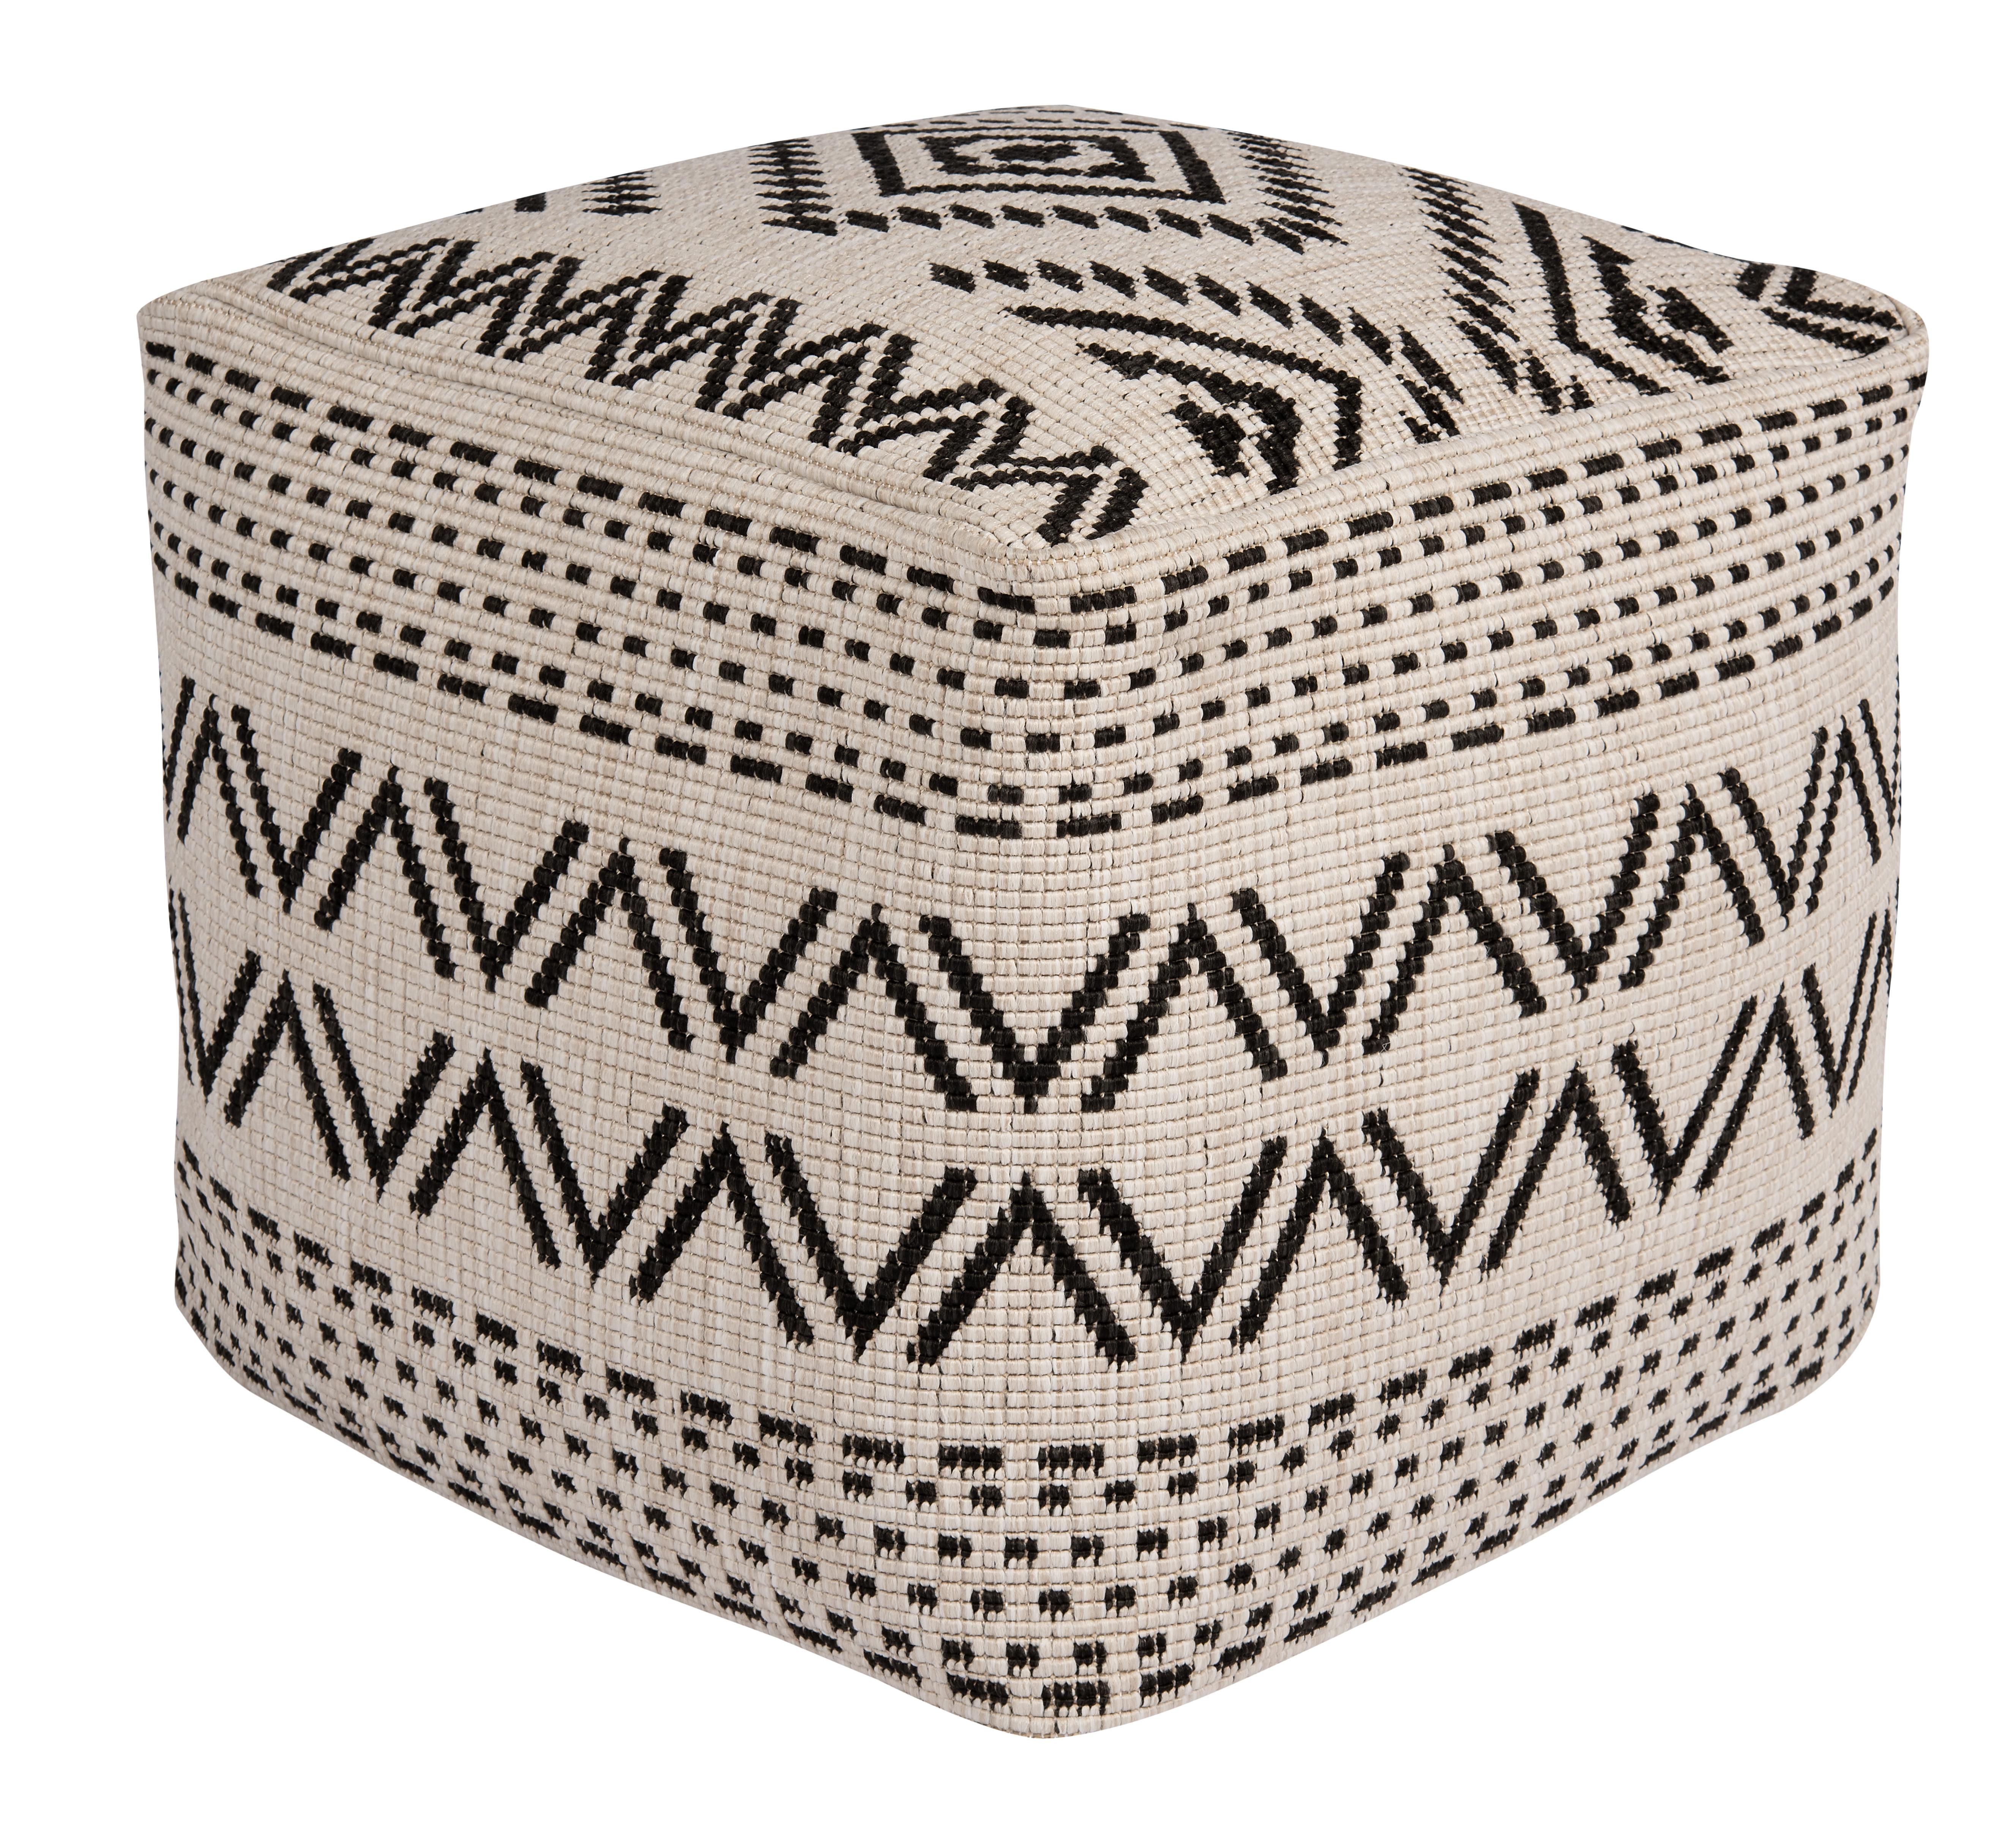 Bougari - Hanse Home koberce Venkovní sedací vak Sahara Black 103823 - 48 x 48 x 42 cm cm